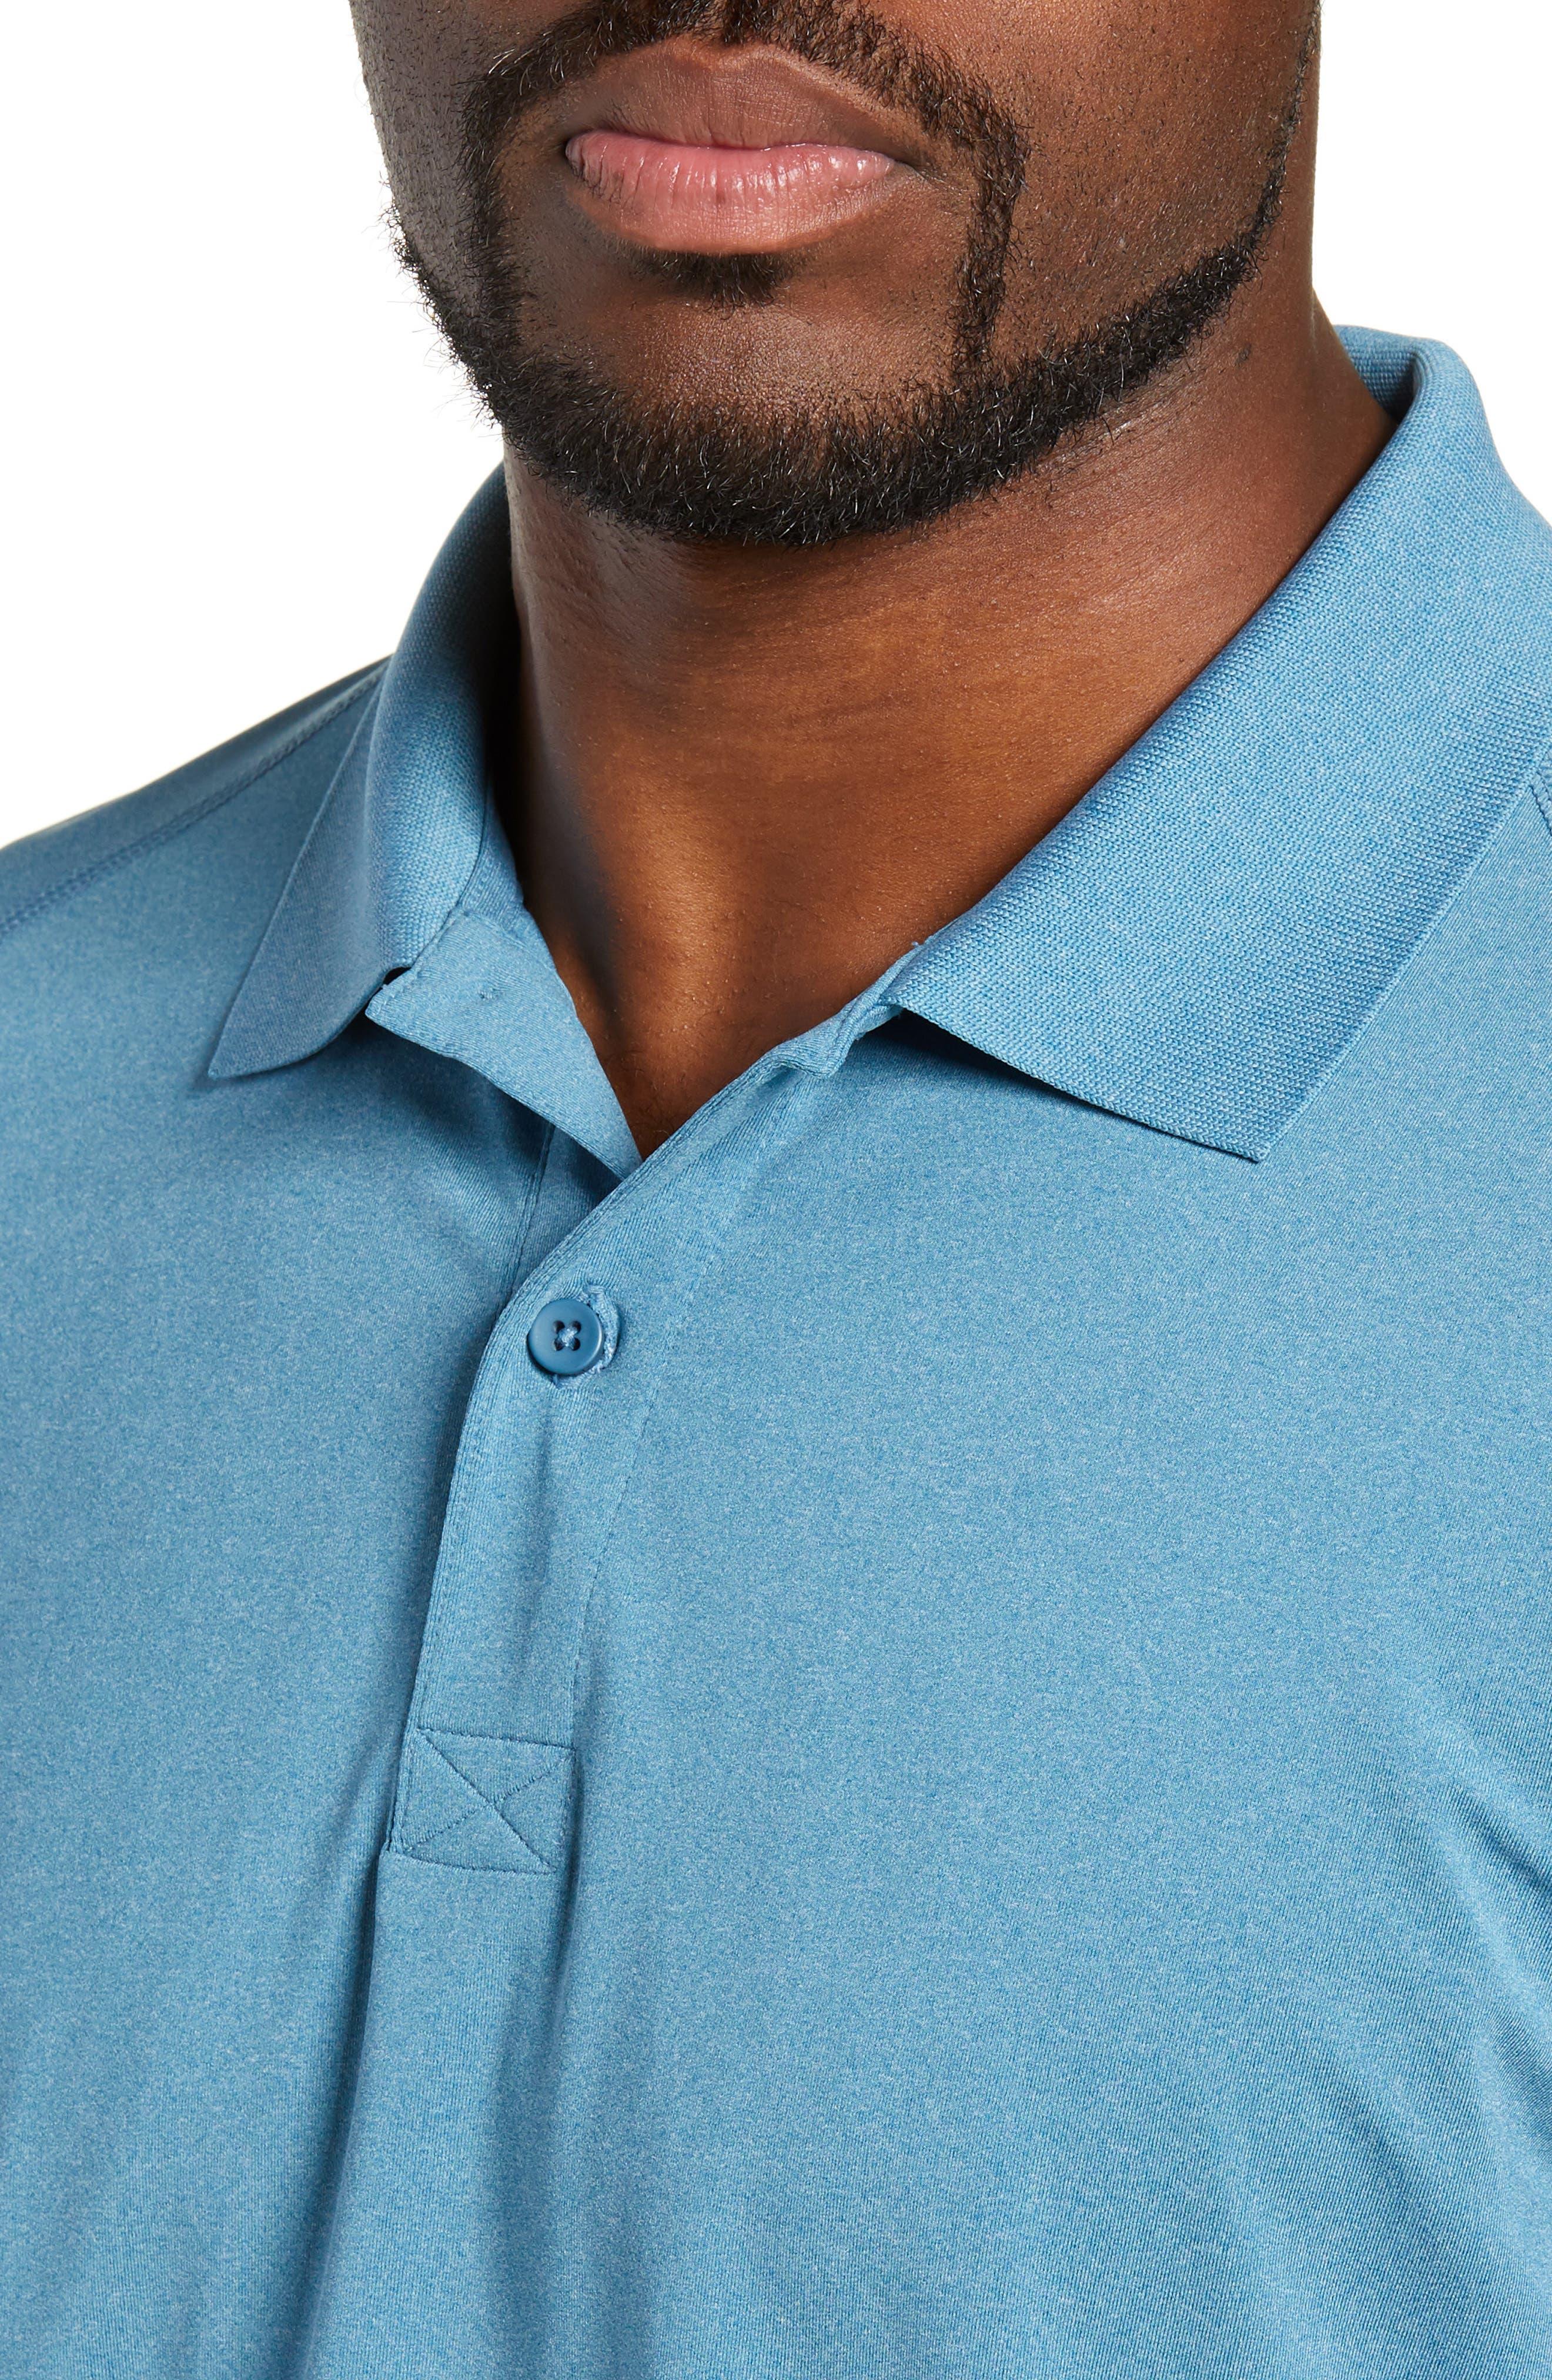 M-Flex Flatiron Slim Fit Golf Polo,                             Alternate thumbnail 4, color,                             HEATHERED BLUE